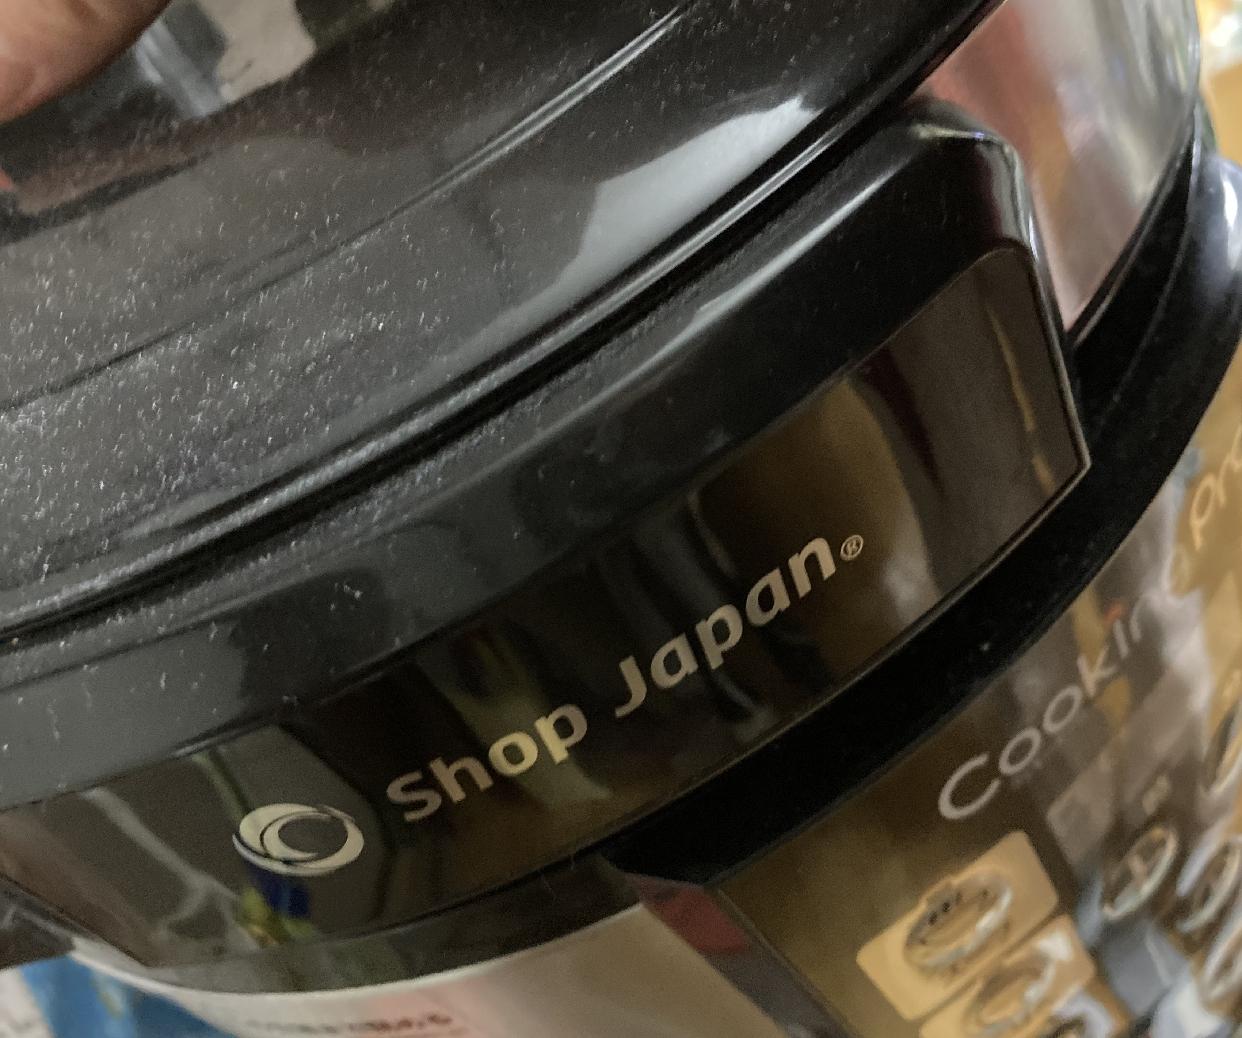 Shop Japan(ショップジャパン)クッキングプロ (電気圧力鍋)を使った らむさんの口コミ画像1